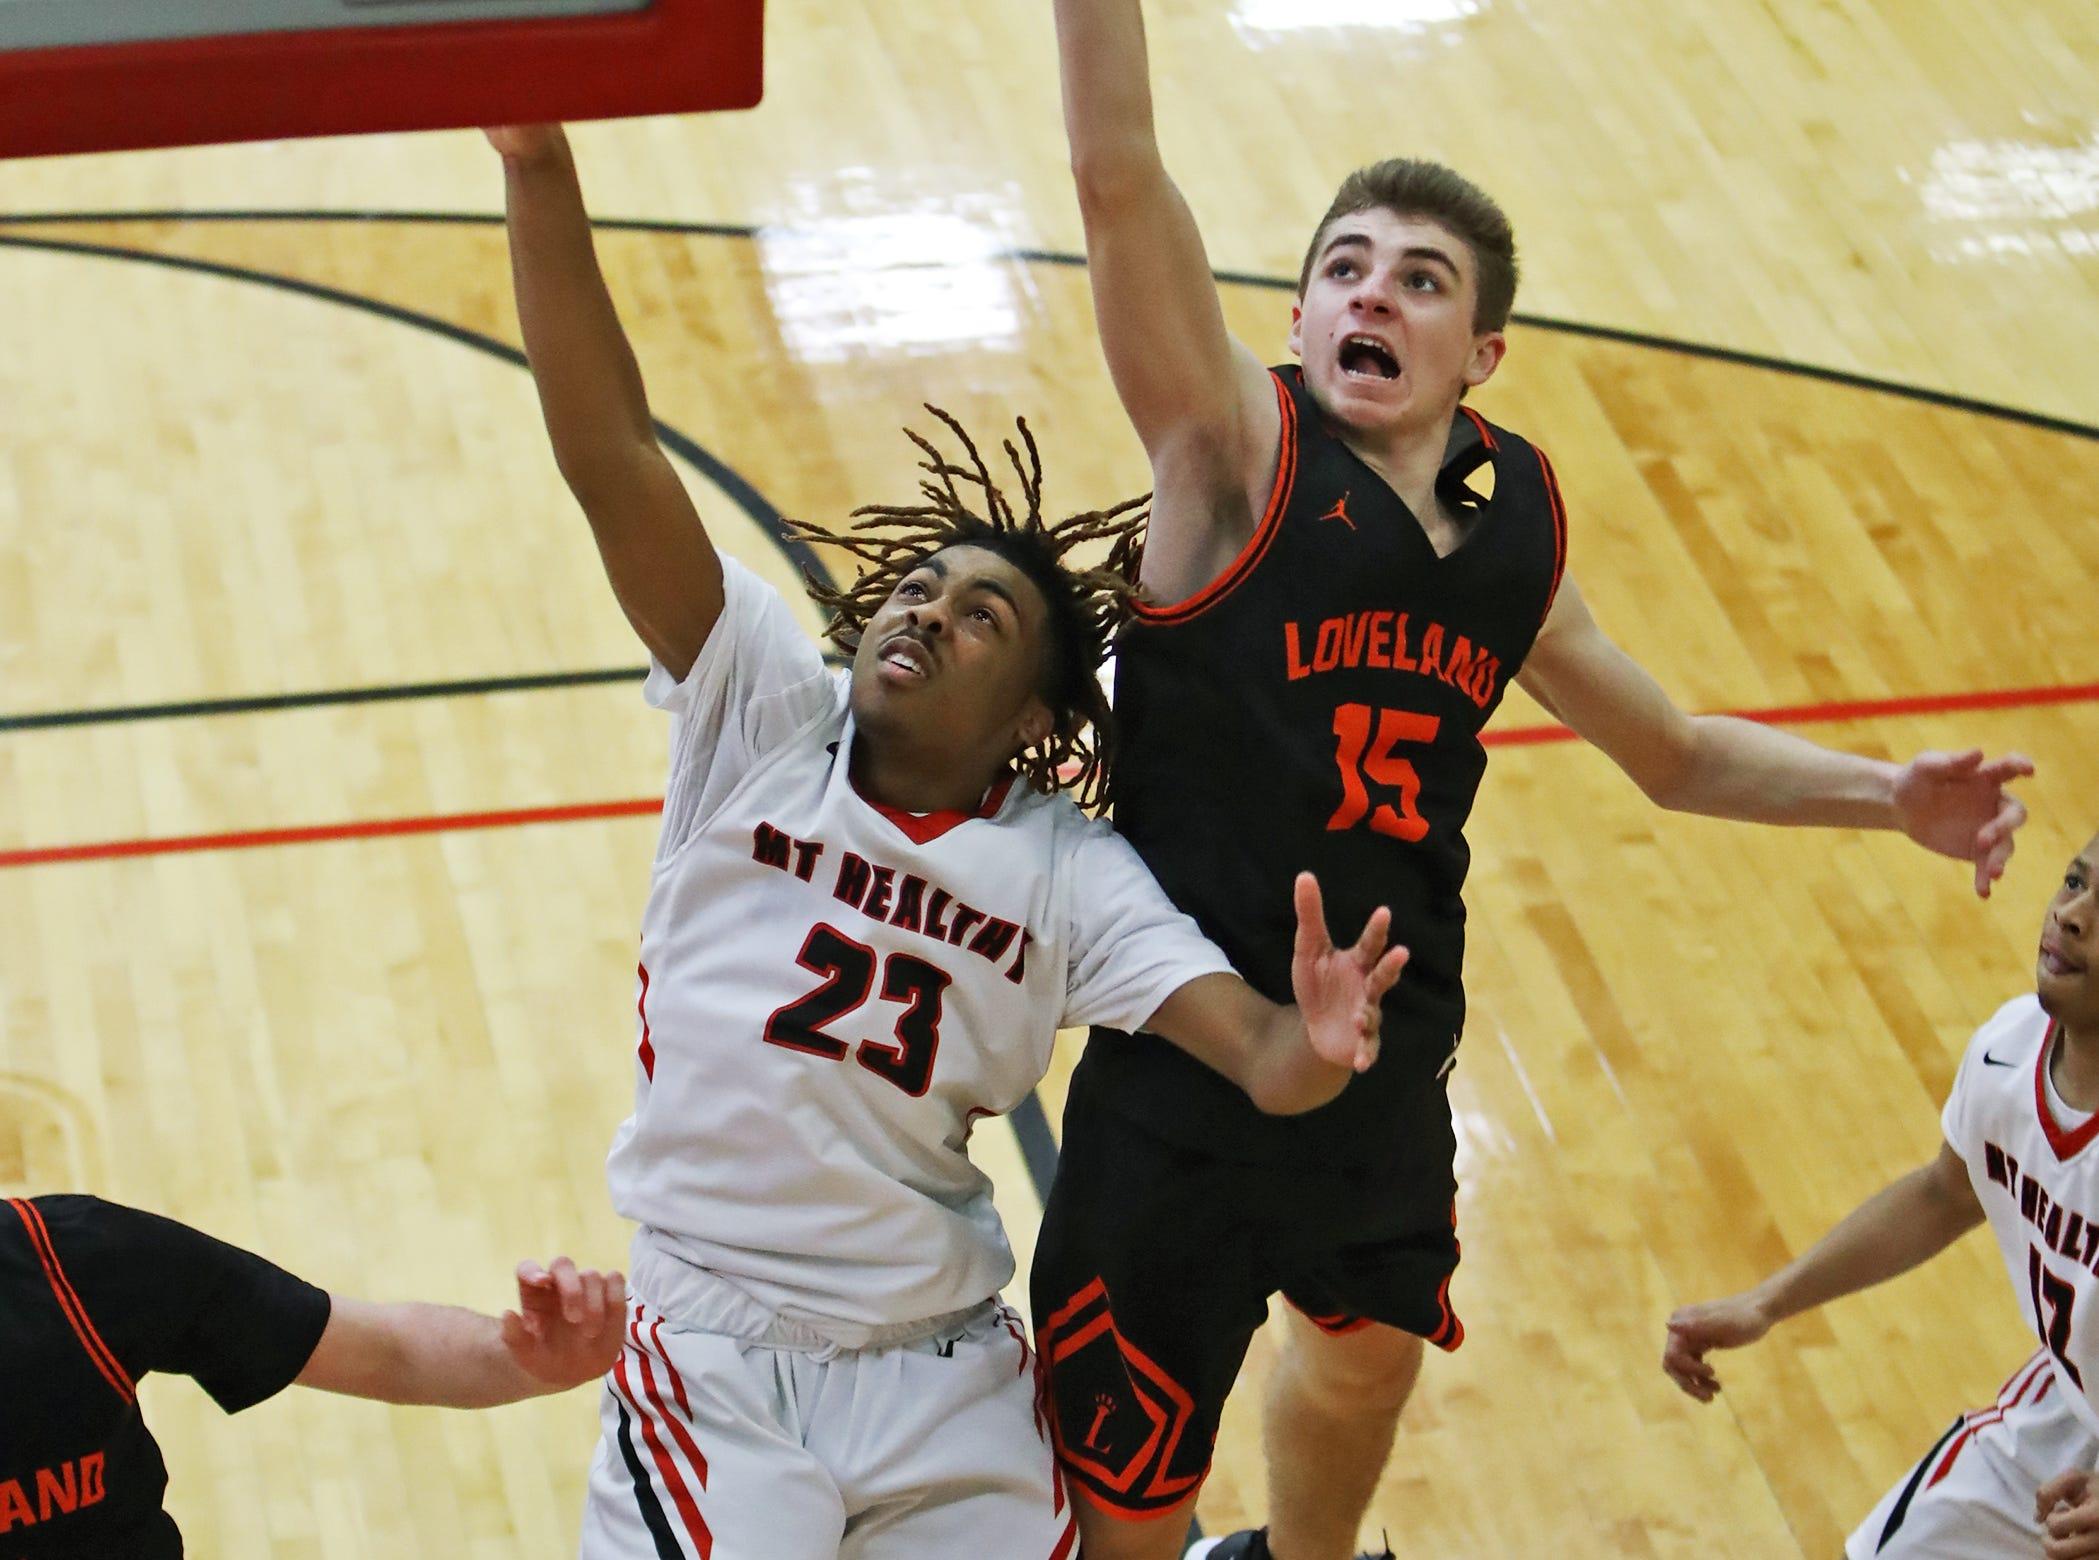 Loveland guard Matt Toigo and Mount Healthy guard Chris Simmons battle for a rebound in the sectional playoffs at Lakota West High School Feb. 23, 2019. Mount Healthy defeated Loveland 62-57.